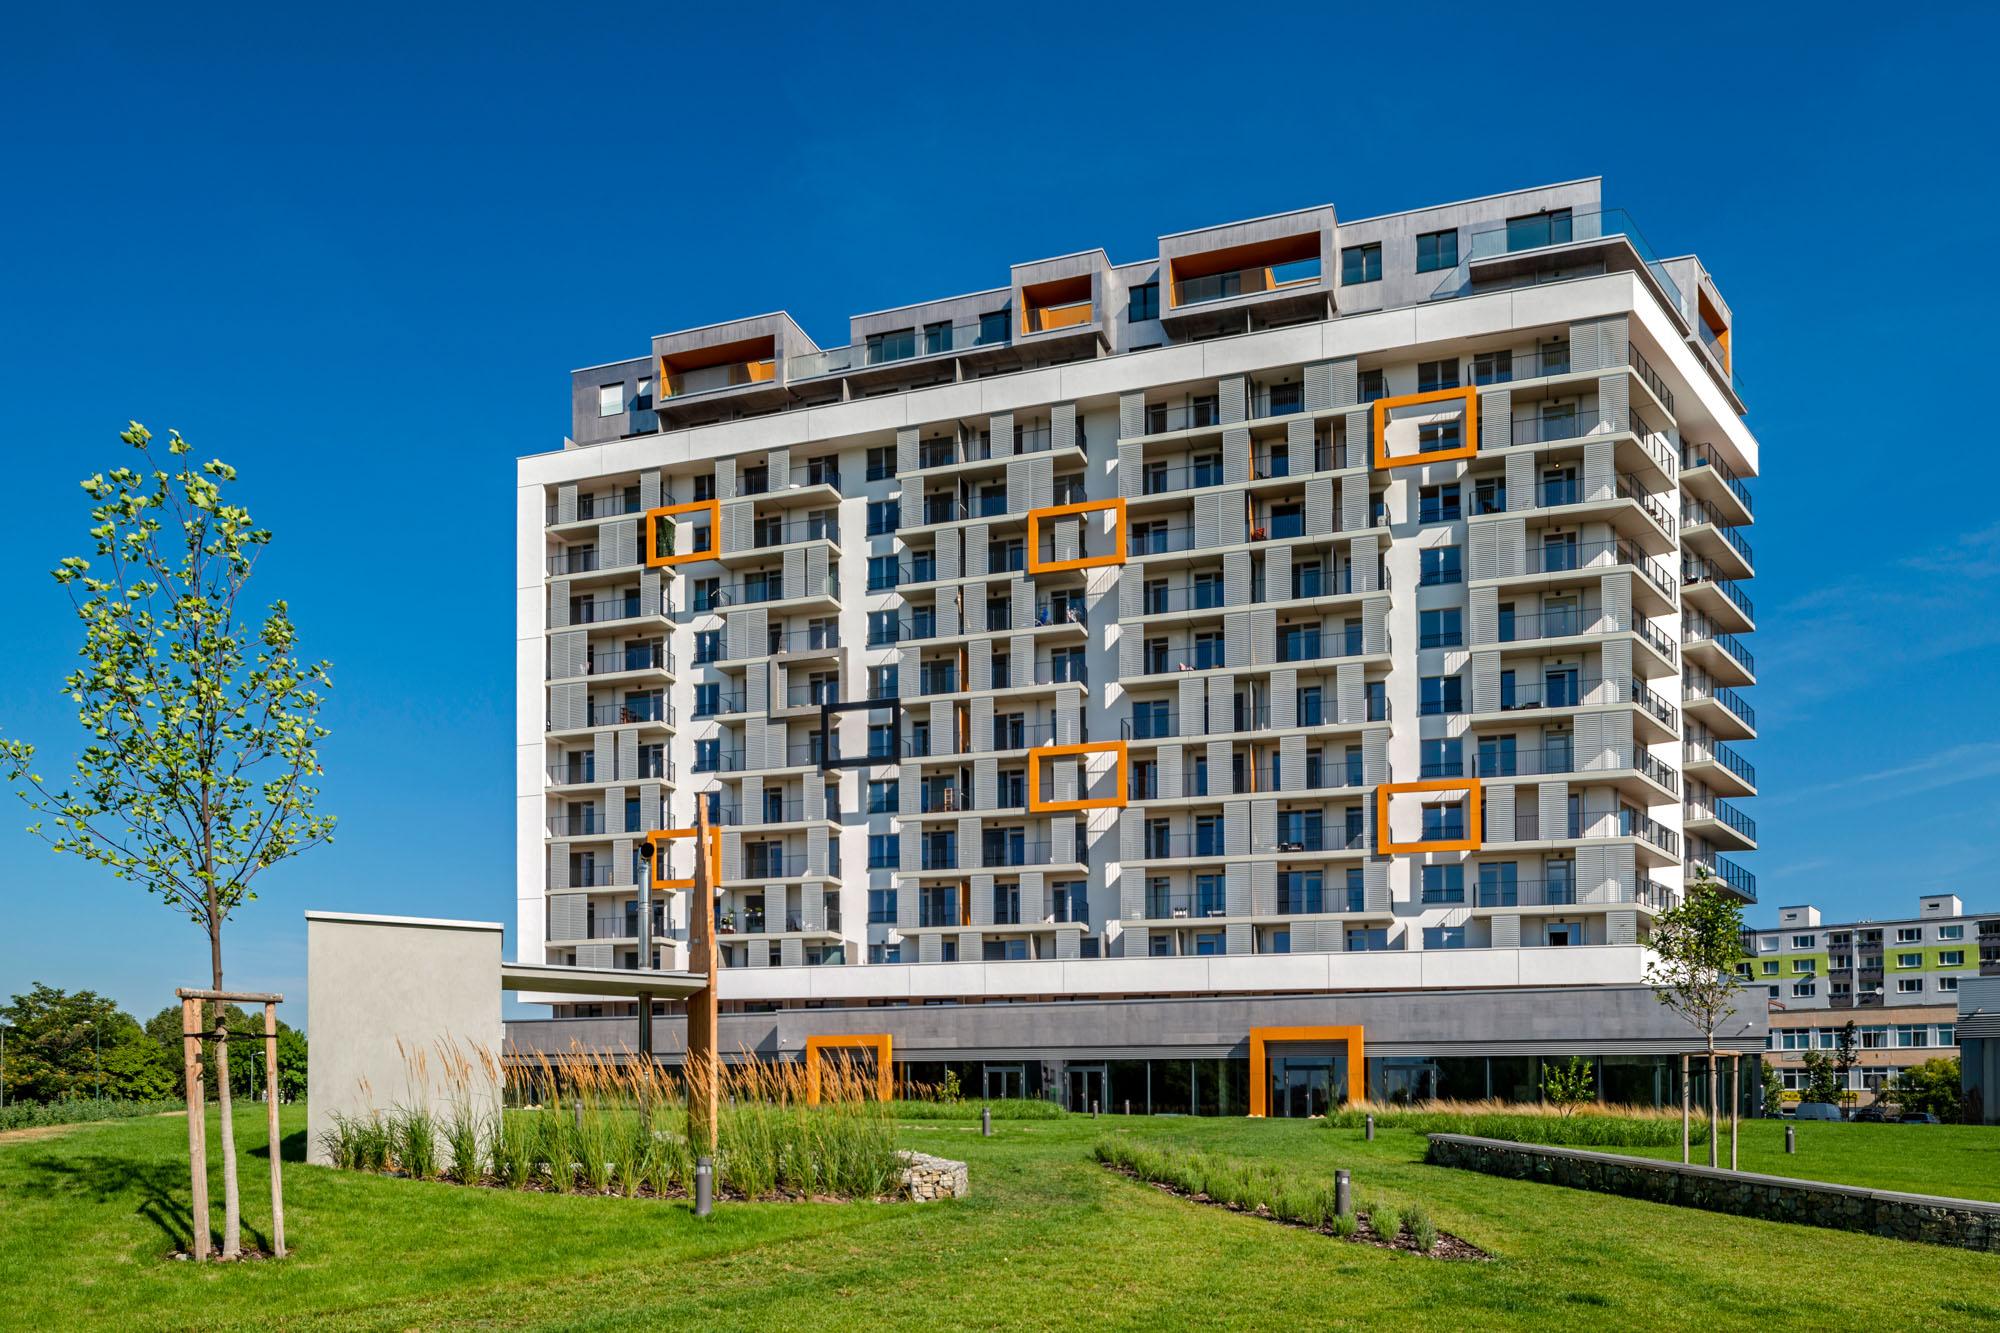 petrzalka_city_2019-0009